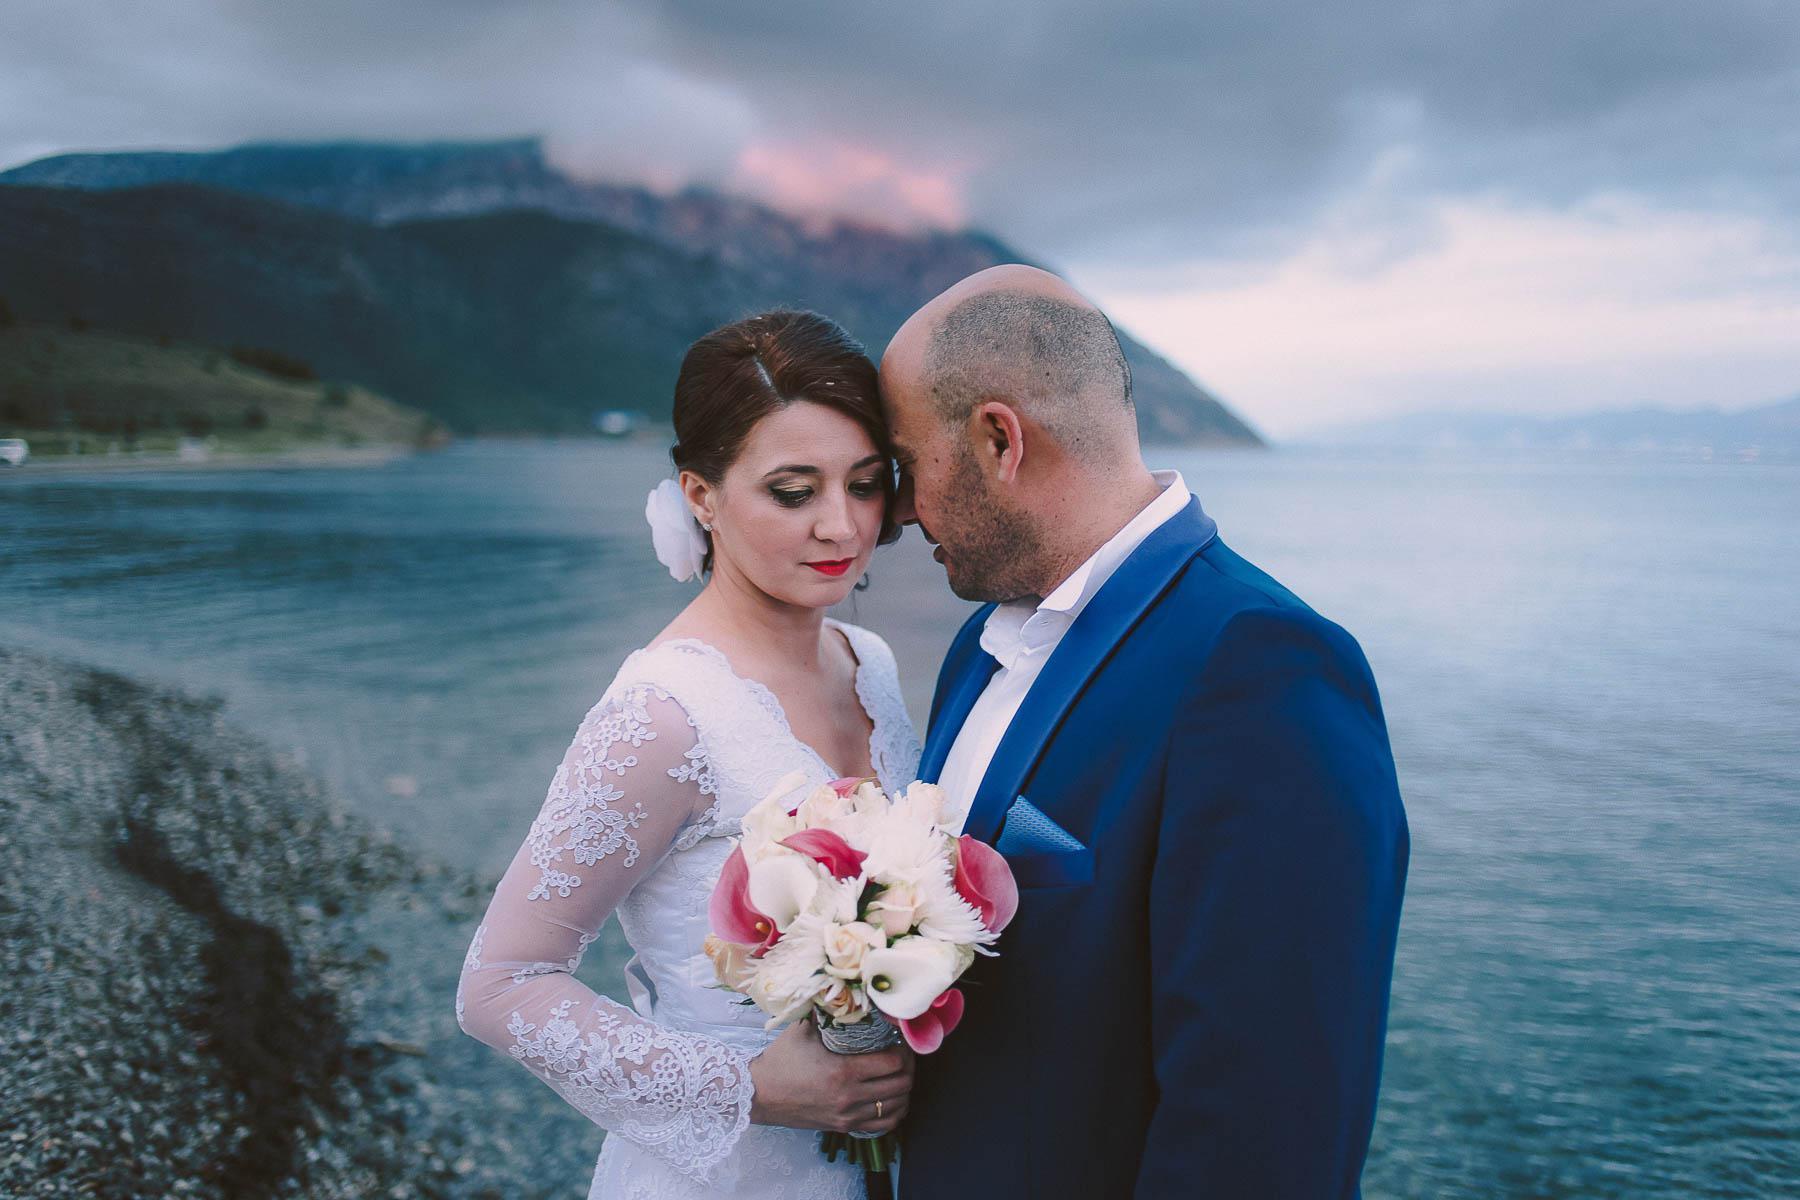 destination-wedding-in-lake-aitoliko-messolonghi-in-greece075